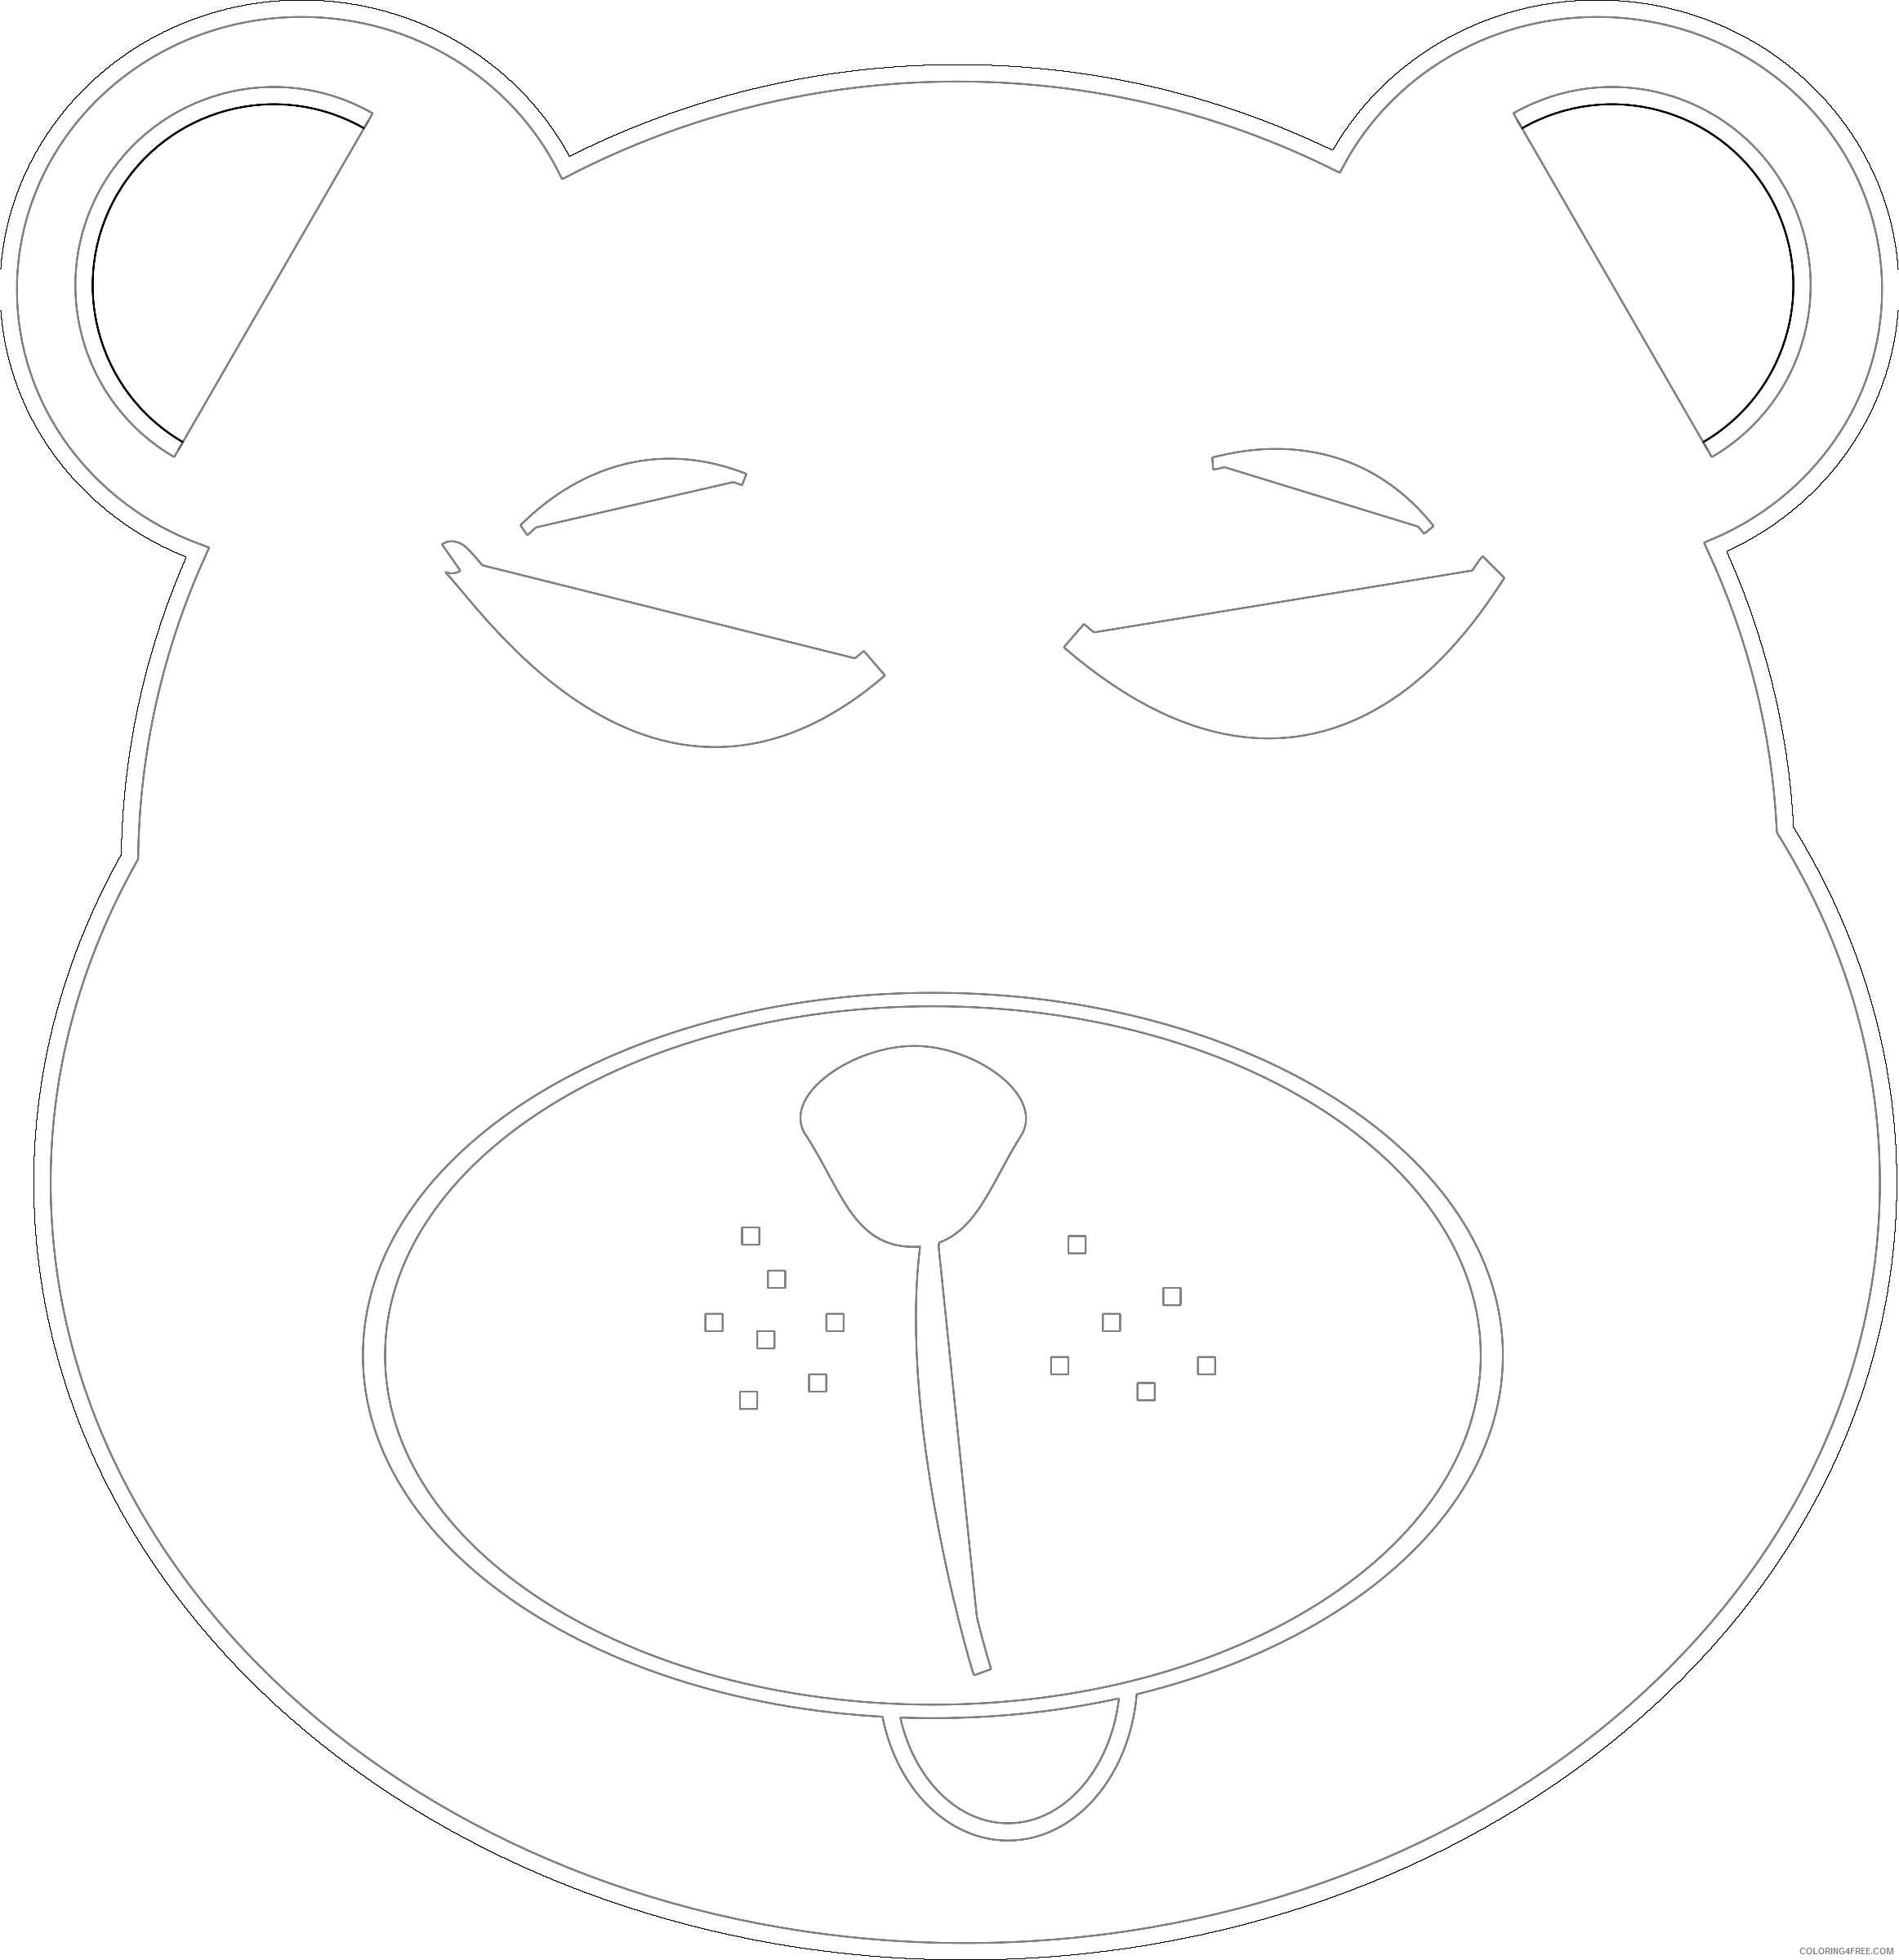 blue bear by newtonguarinof 2LXqi0 coloring